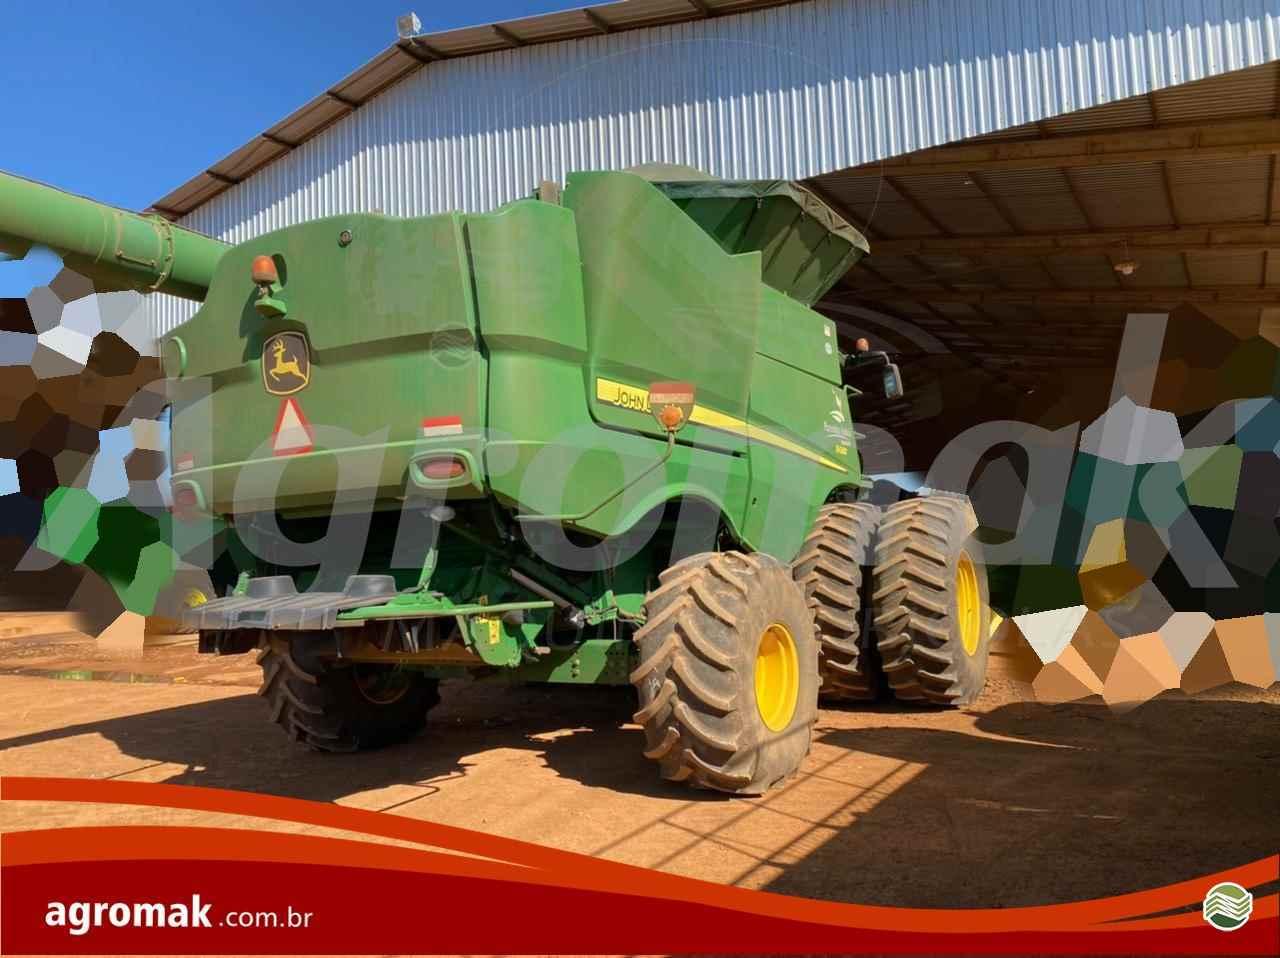 COLHEITADEIRA JOHN DEERE JOHN DEERE S680 Agromak Máquinas Agrícolas CAMPO VERDE MATO GROSSO MT